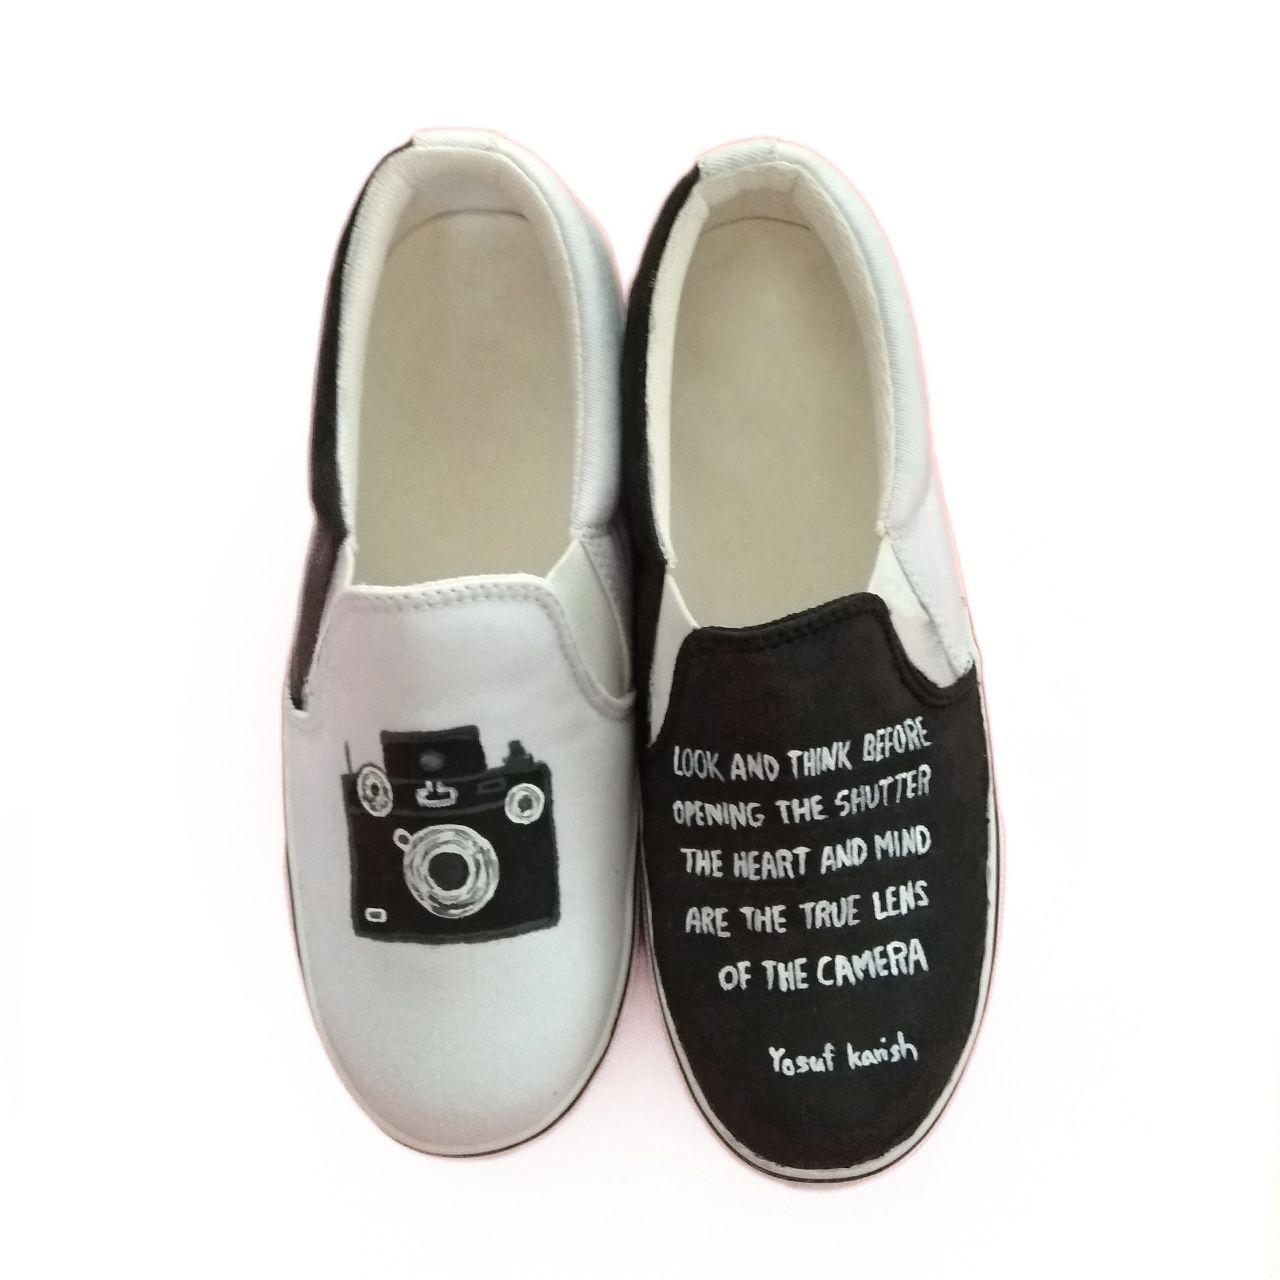 کفش روزمره زنانه دالاوین طرح دوربین کد V-2 -  - 3